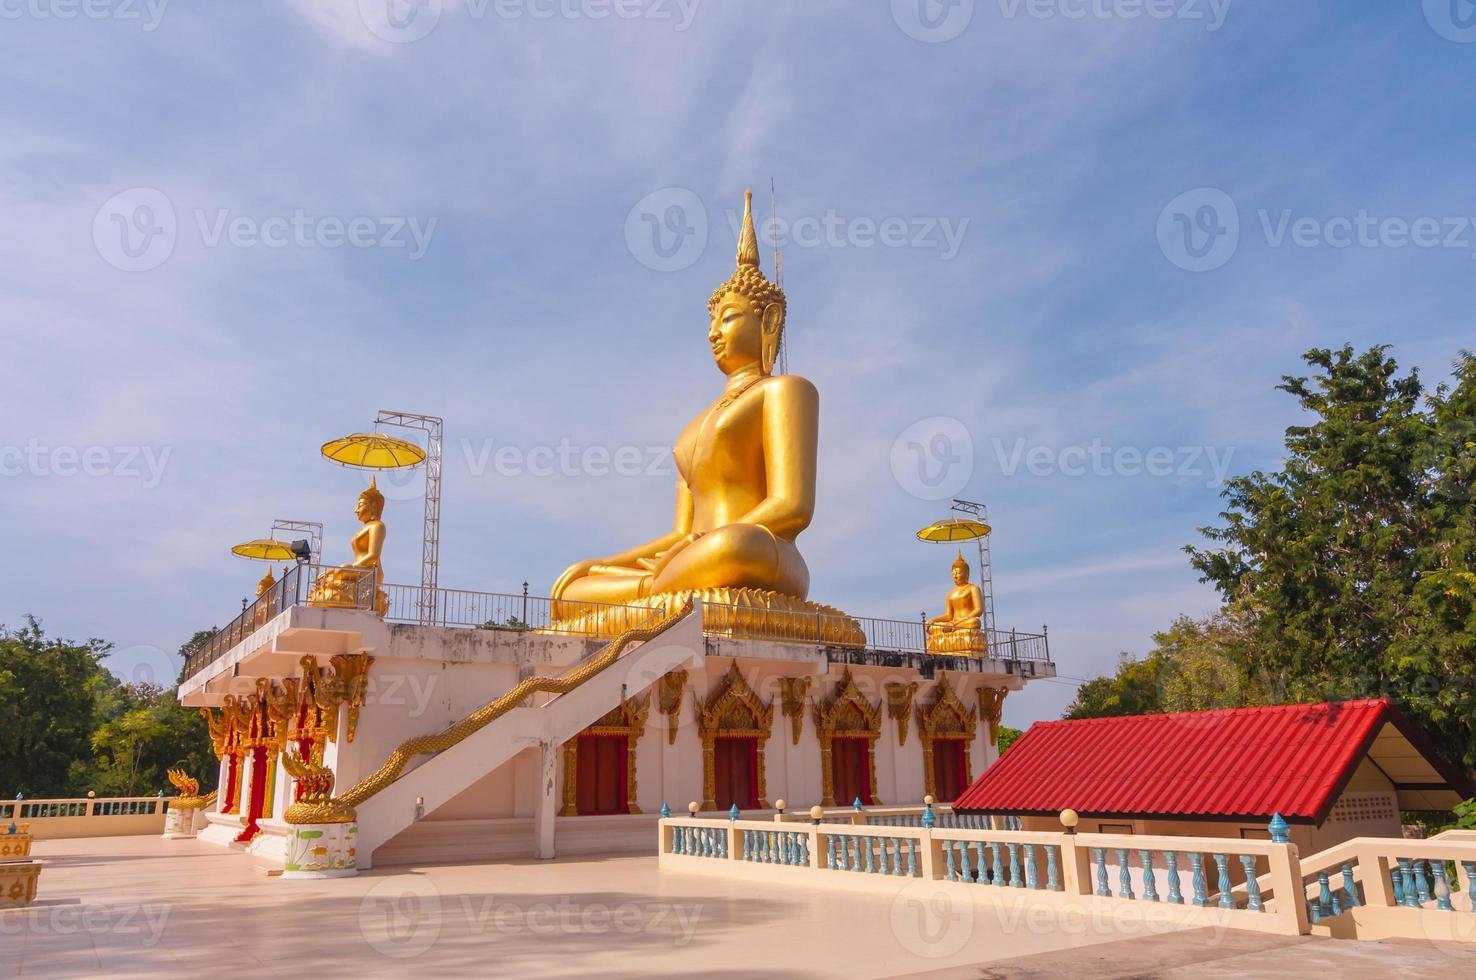 Big beautiful gold Buddha in Wat PhaThep Nimit photo